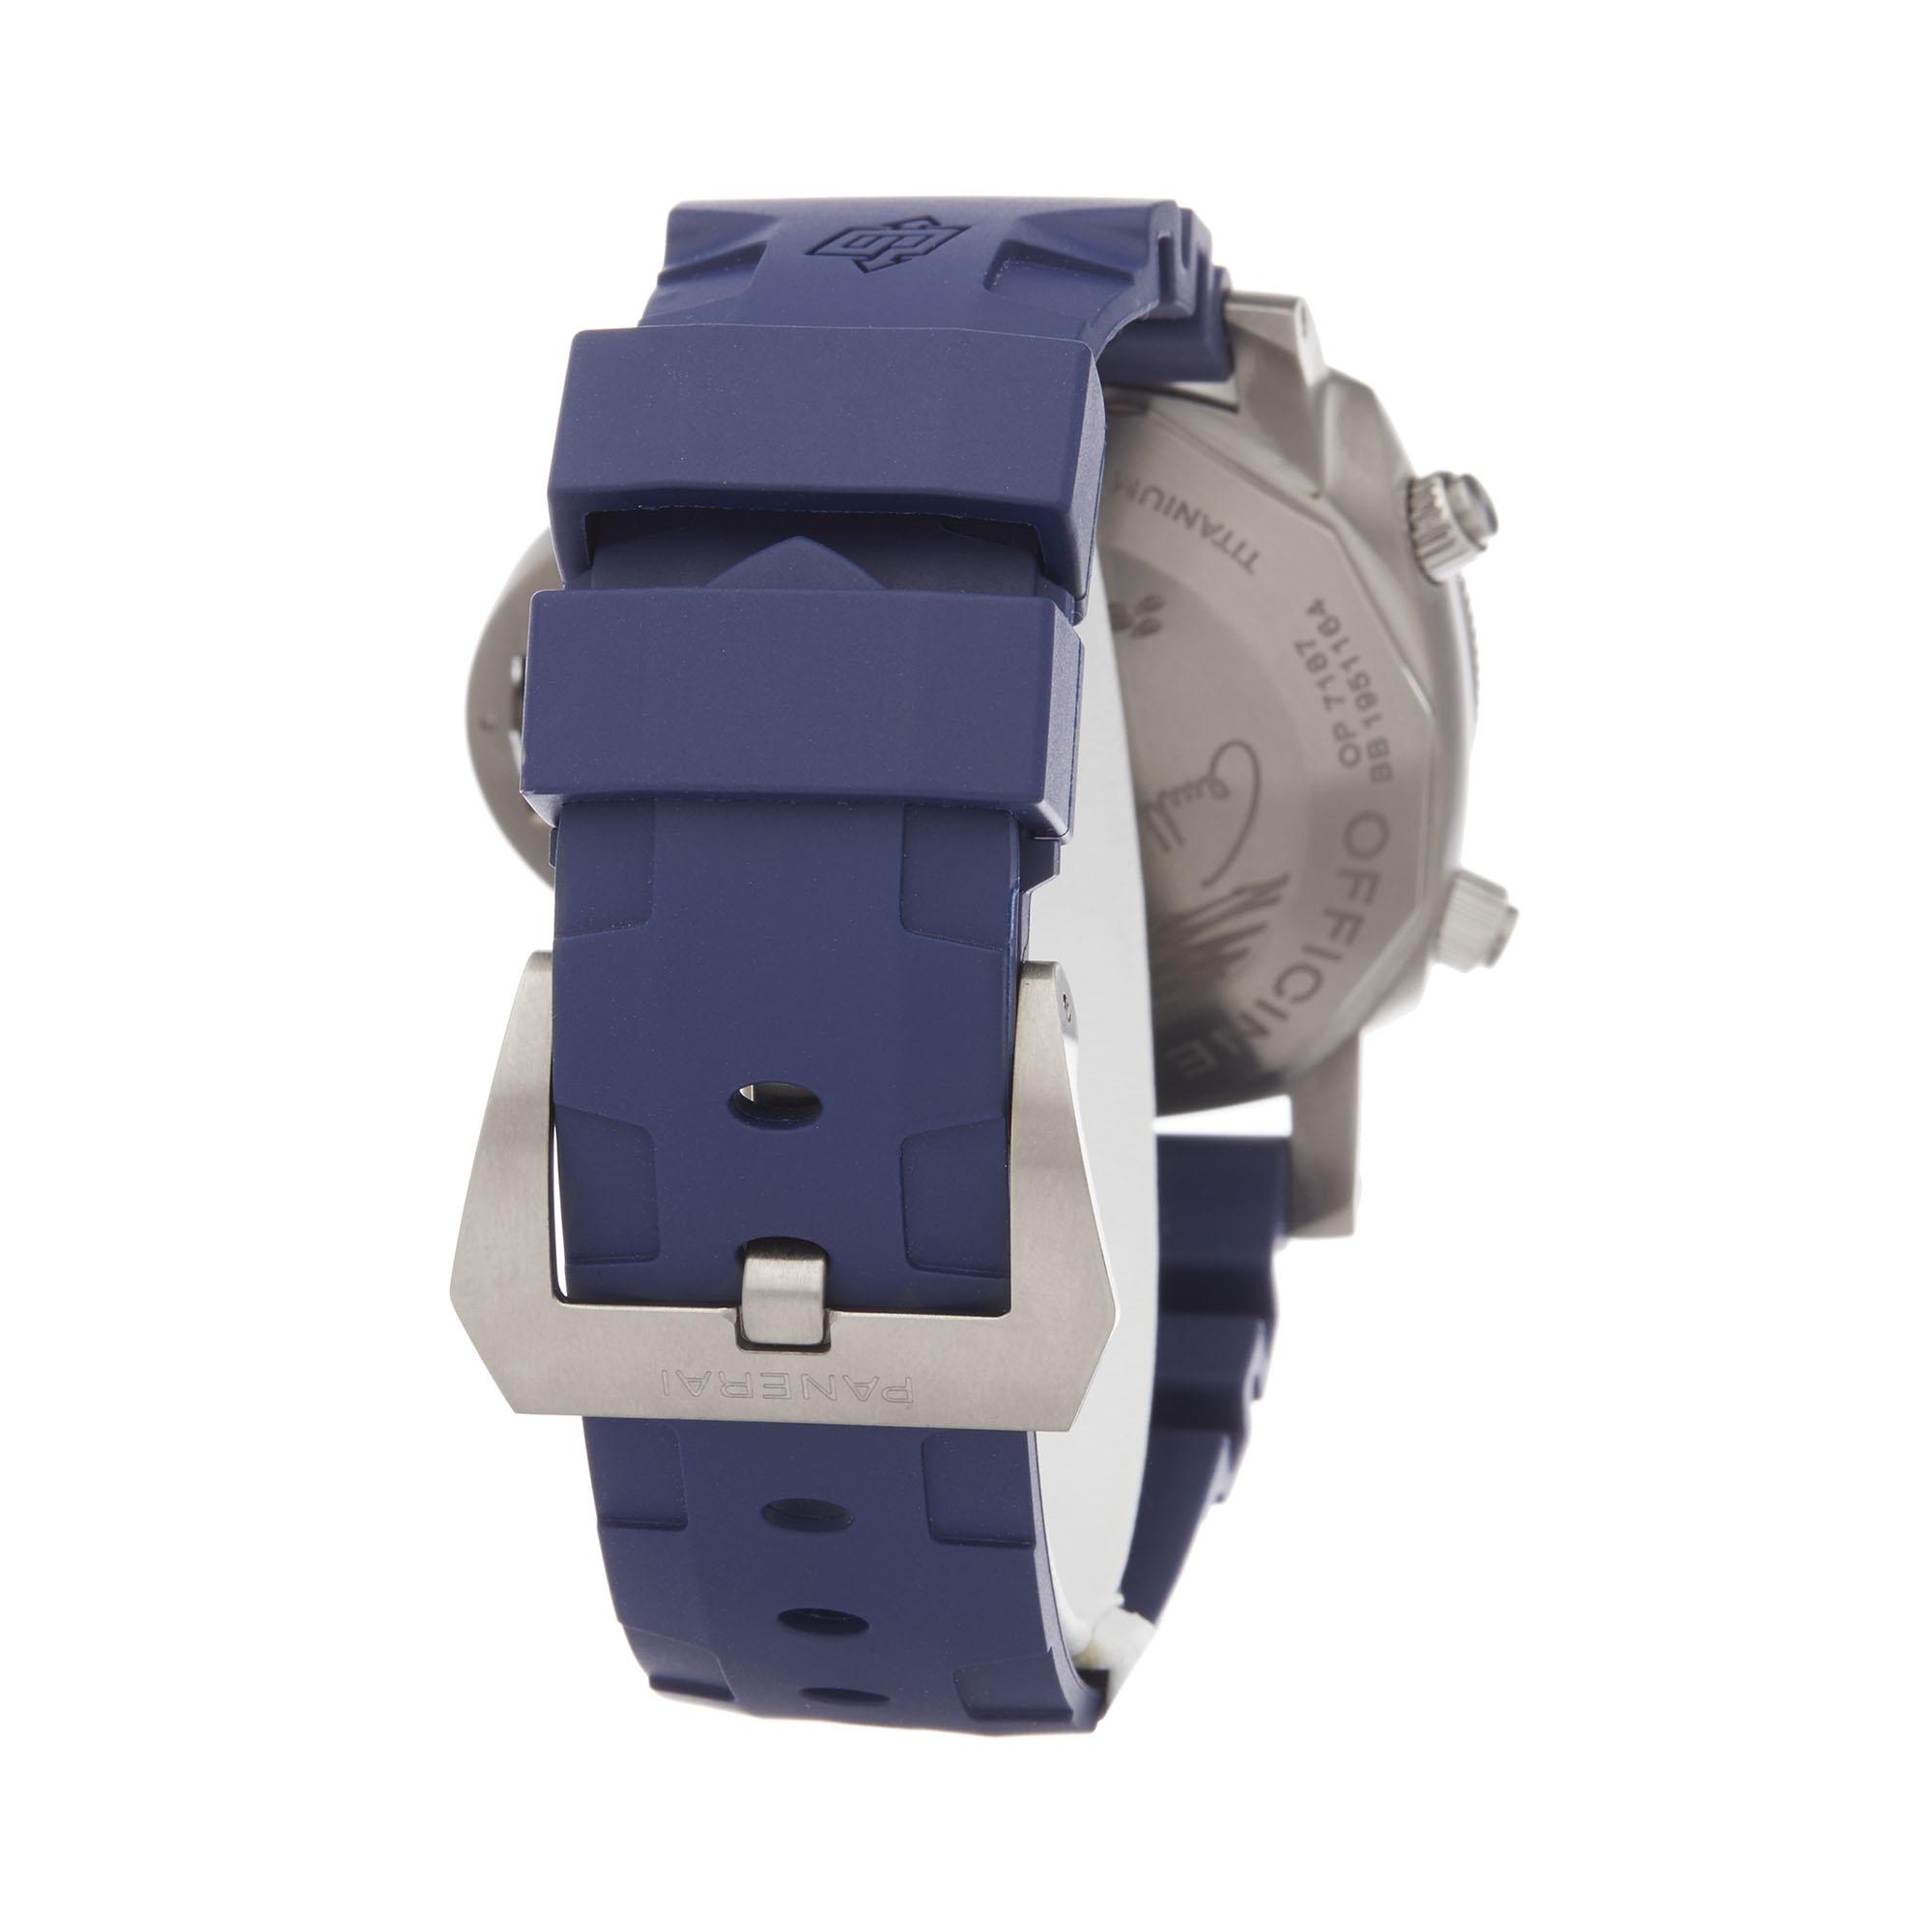 Panerai Luminor Submersible PAM00982 Men Stainless Steel Chronograph Watch - Image 5 of 8